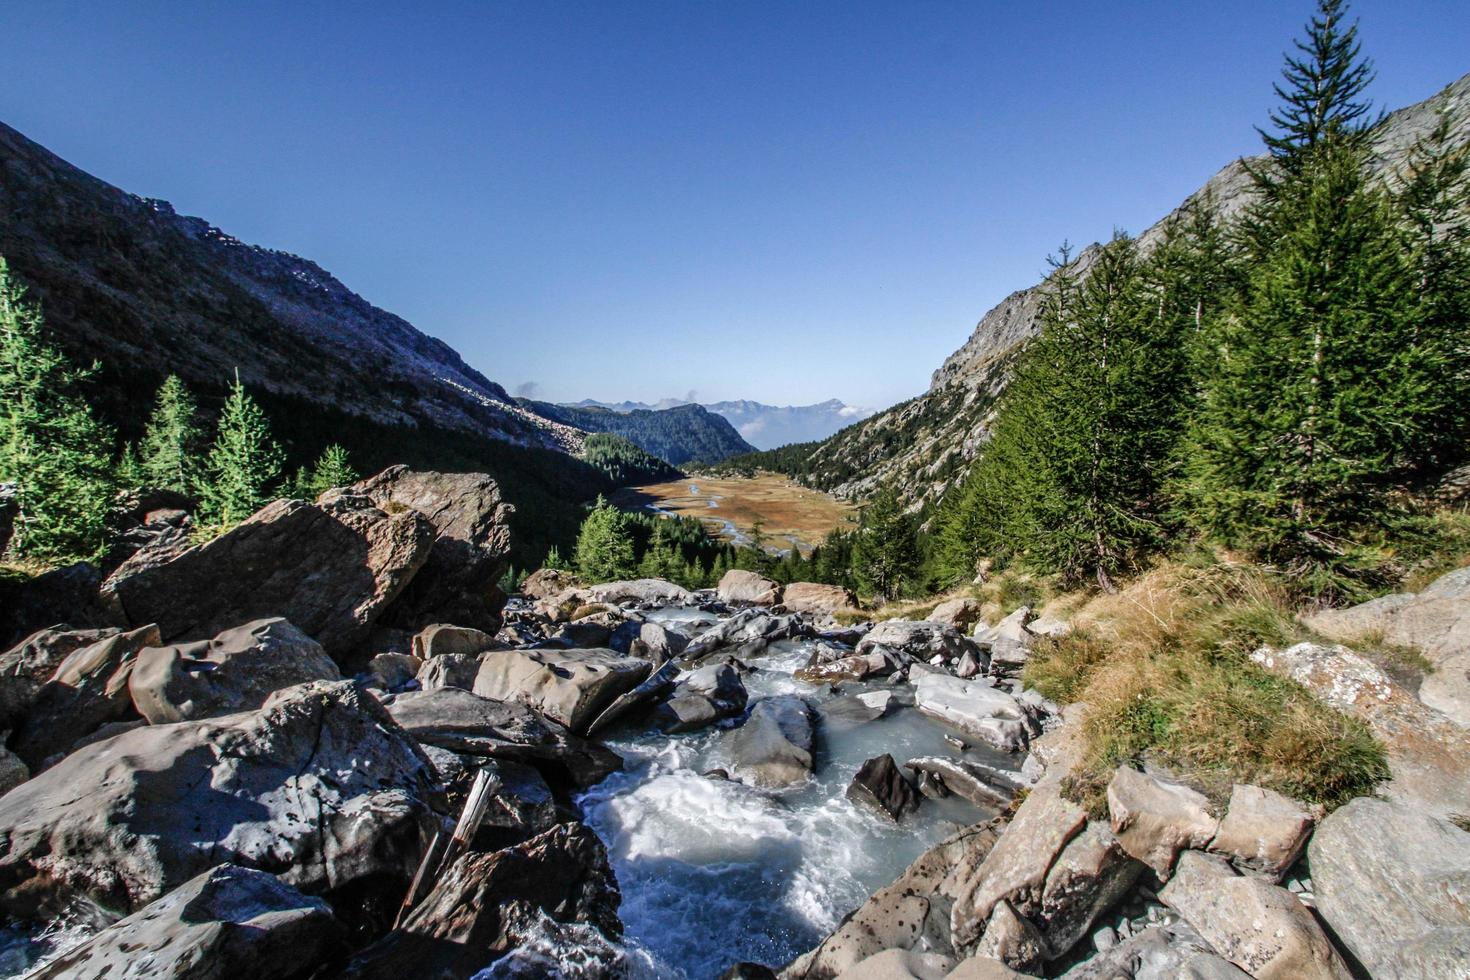 River on rocky mountain photo